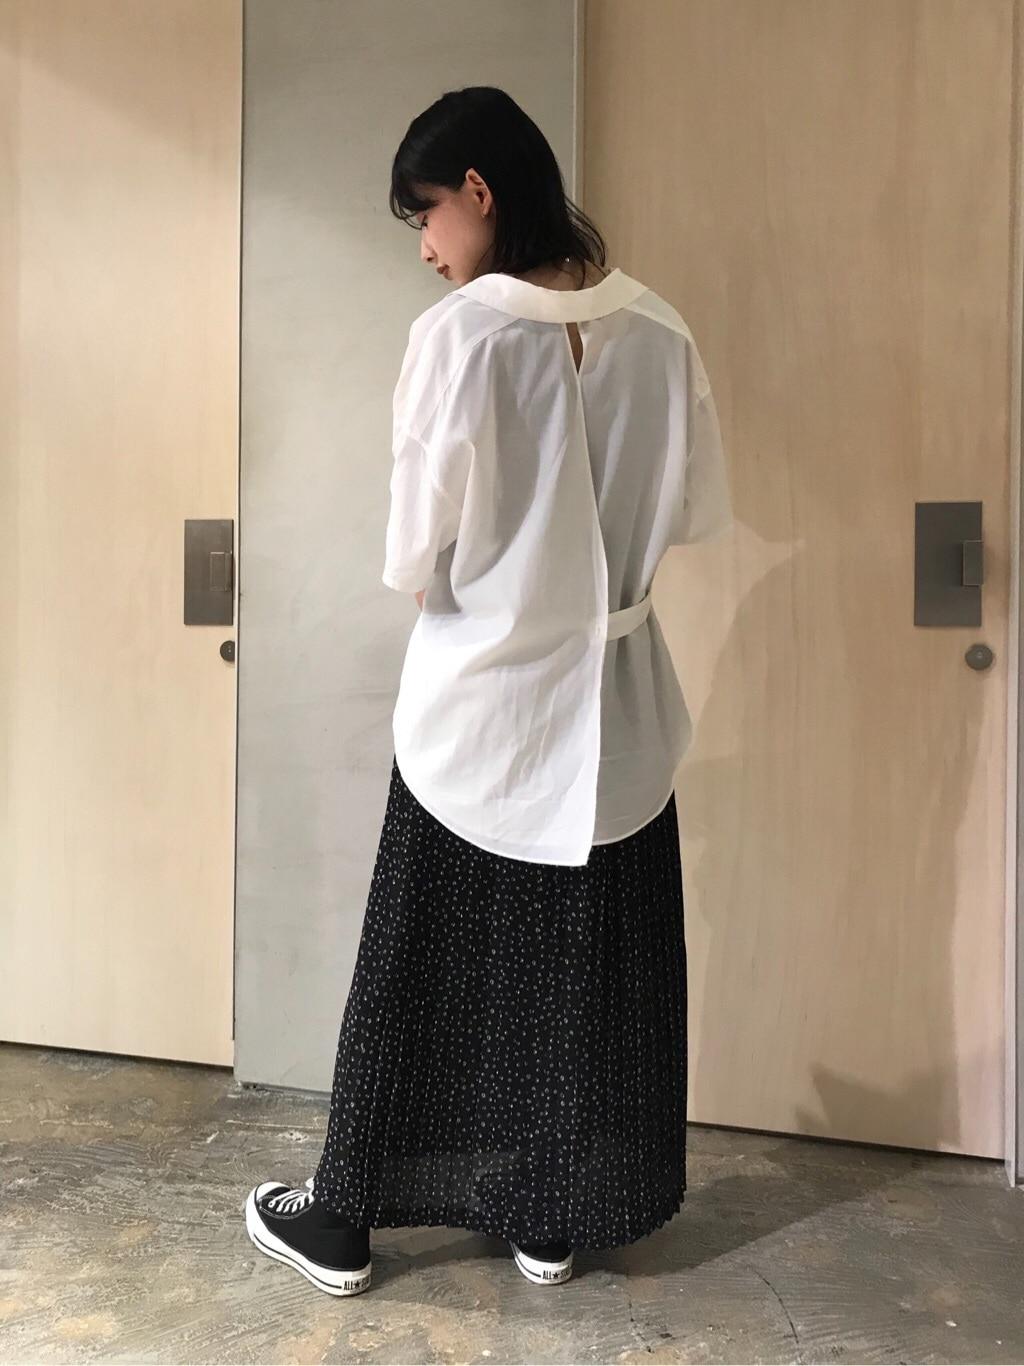 note et silence. ルミネ新宿 身長:159cm 2020.06.23